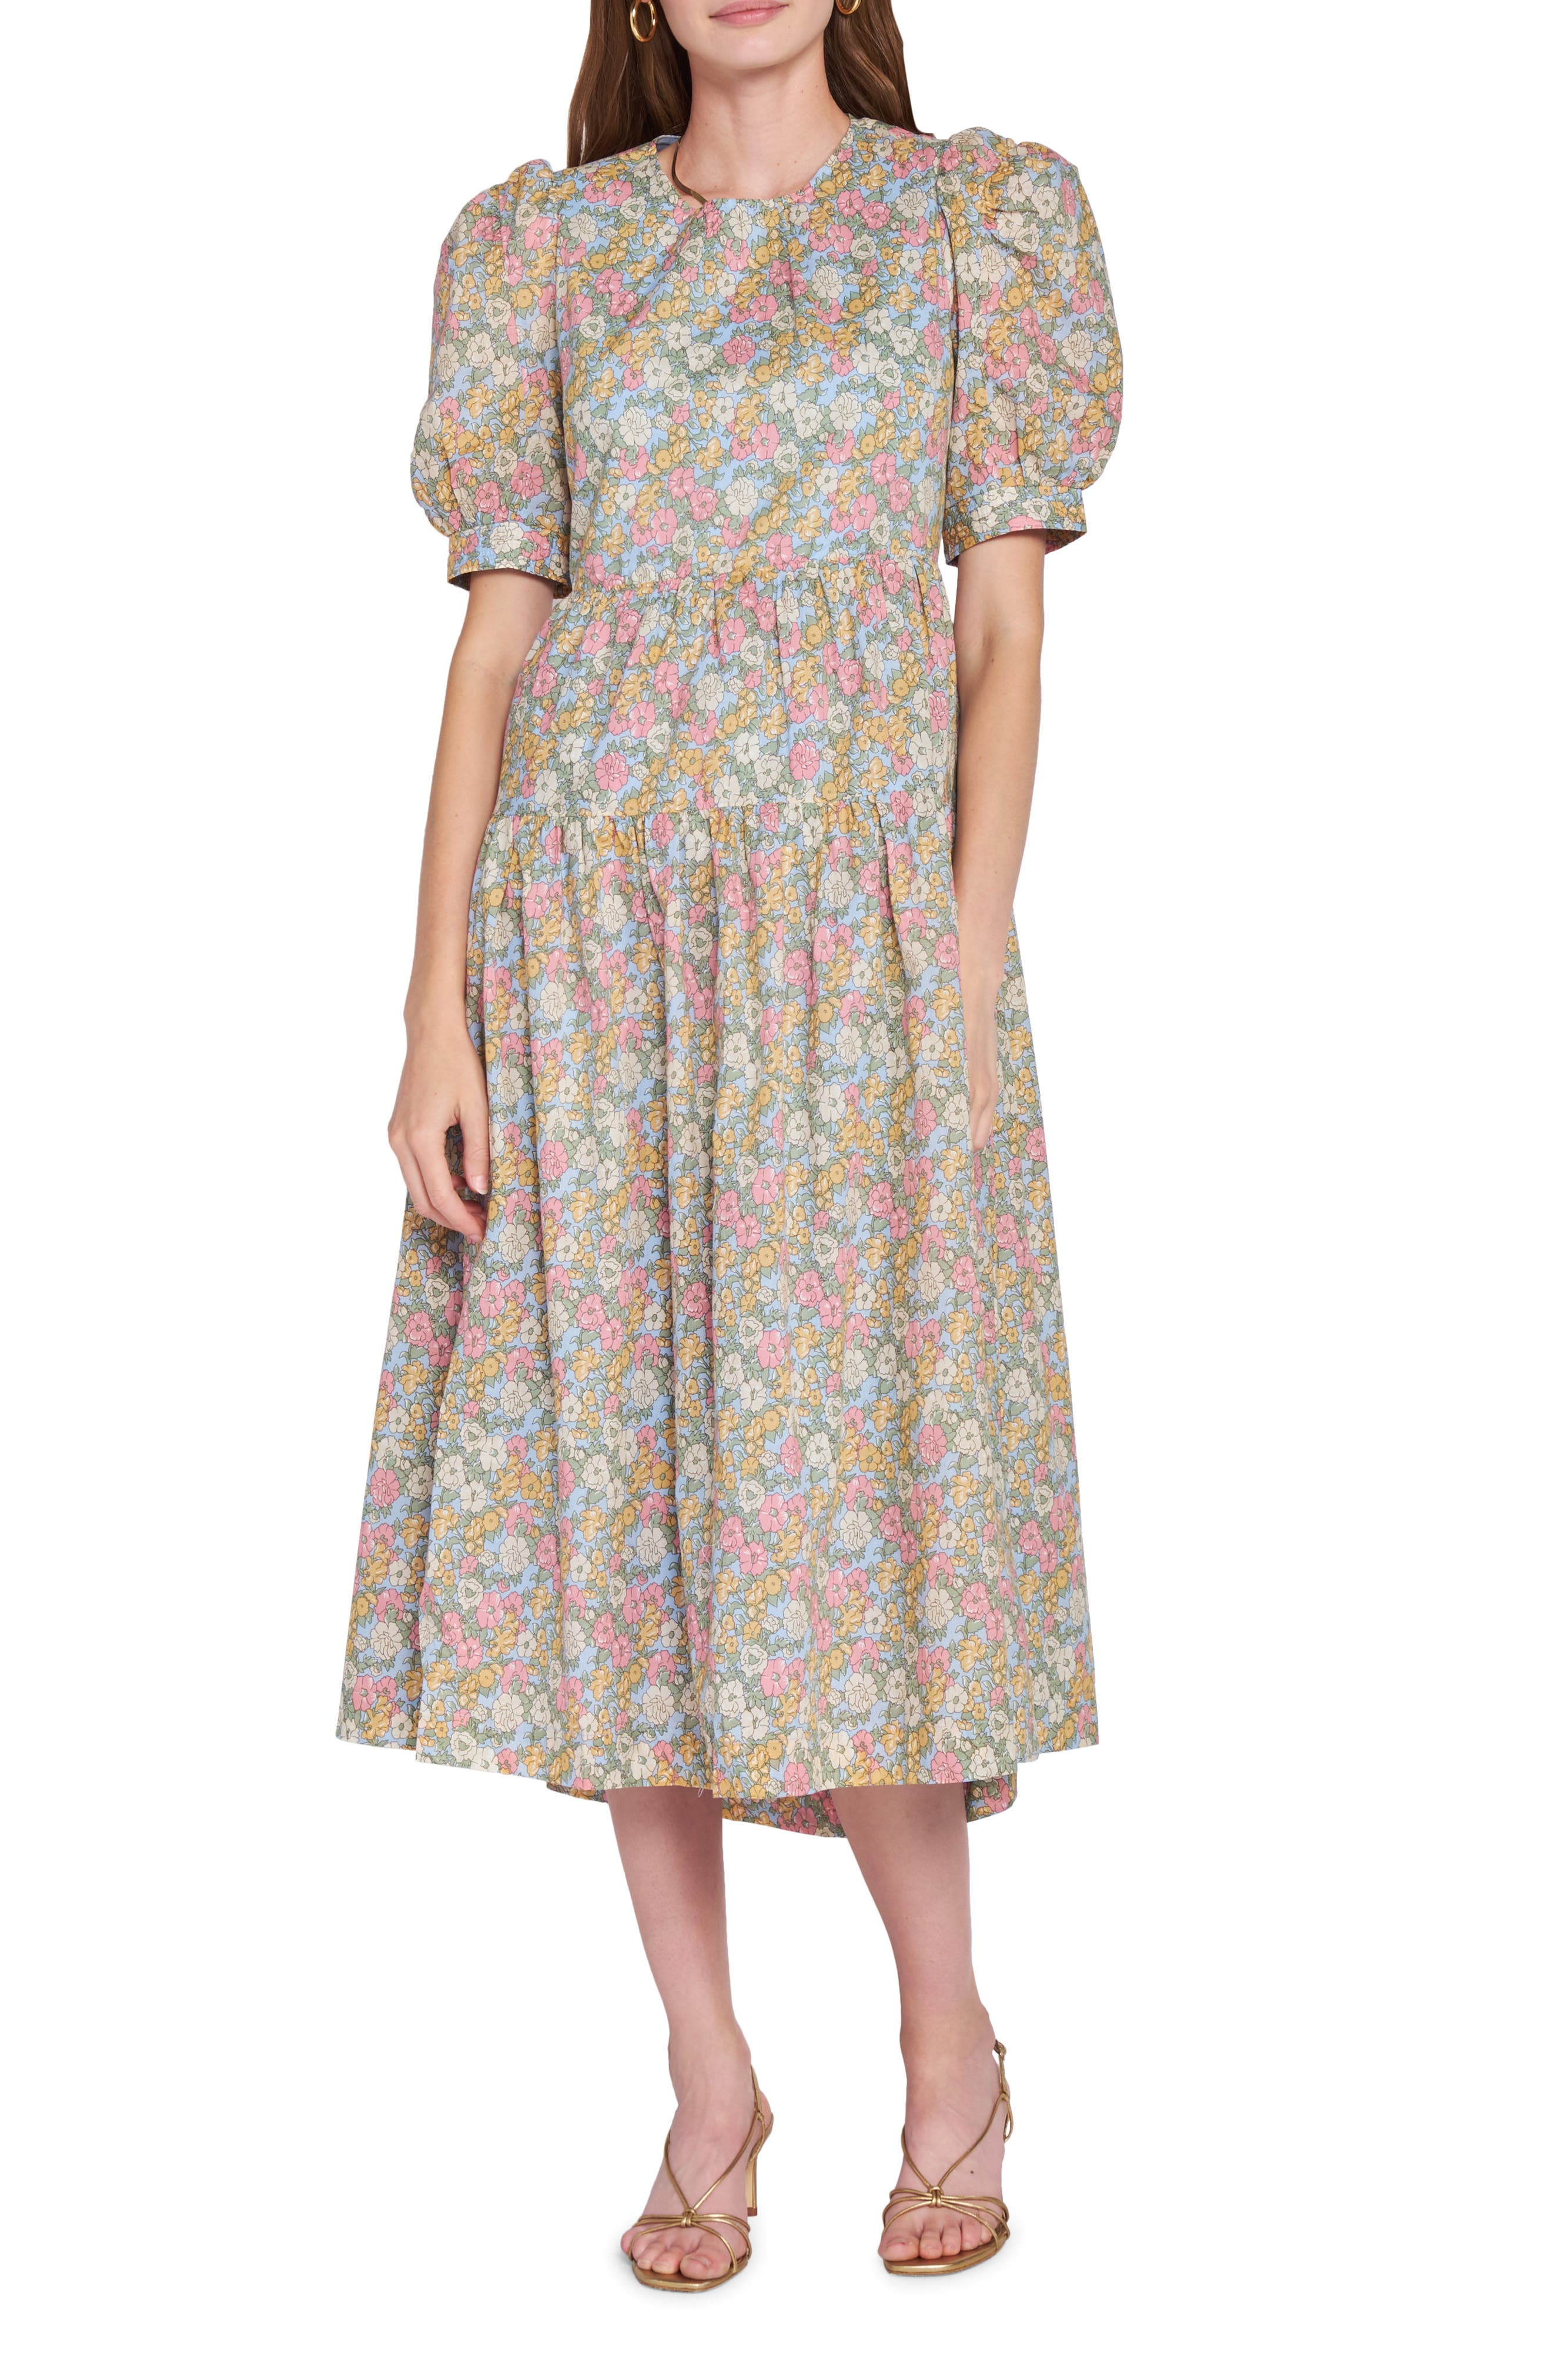 Floral Print Puff Sleeve Cotton Dress